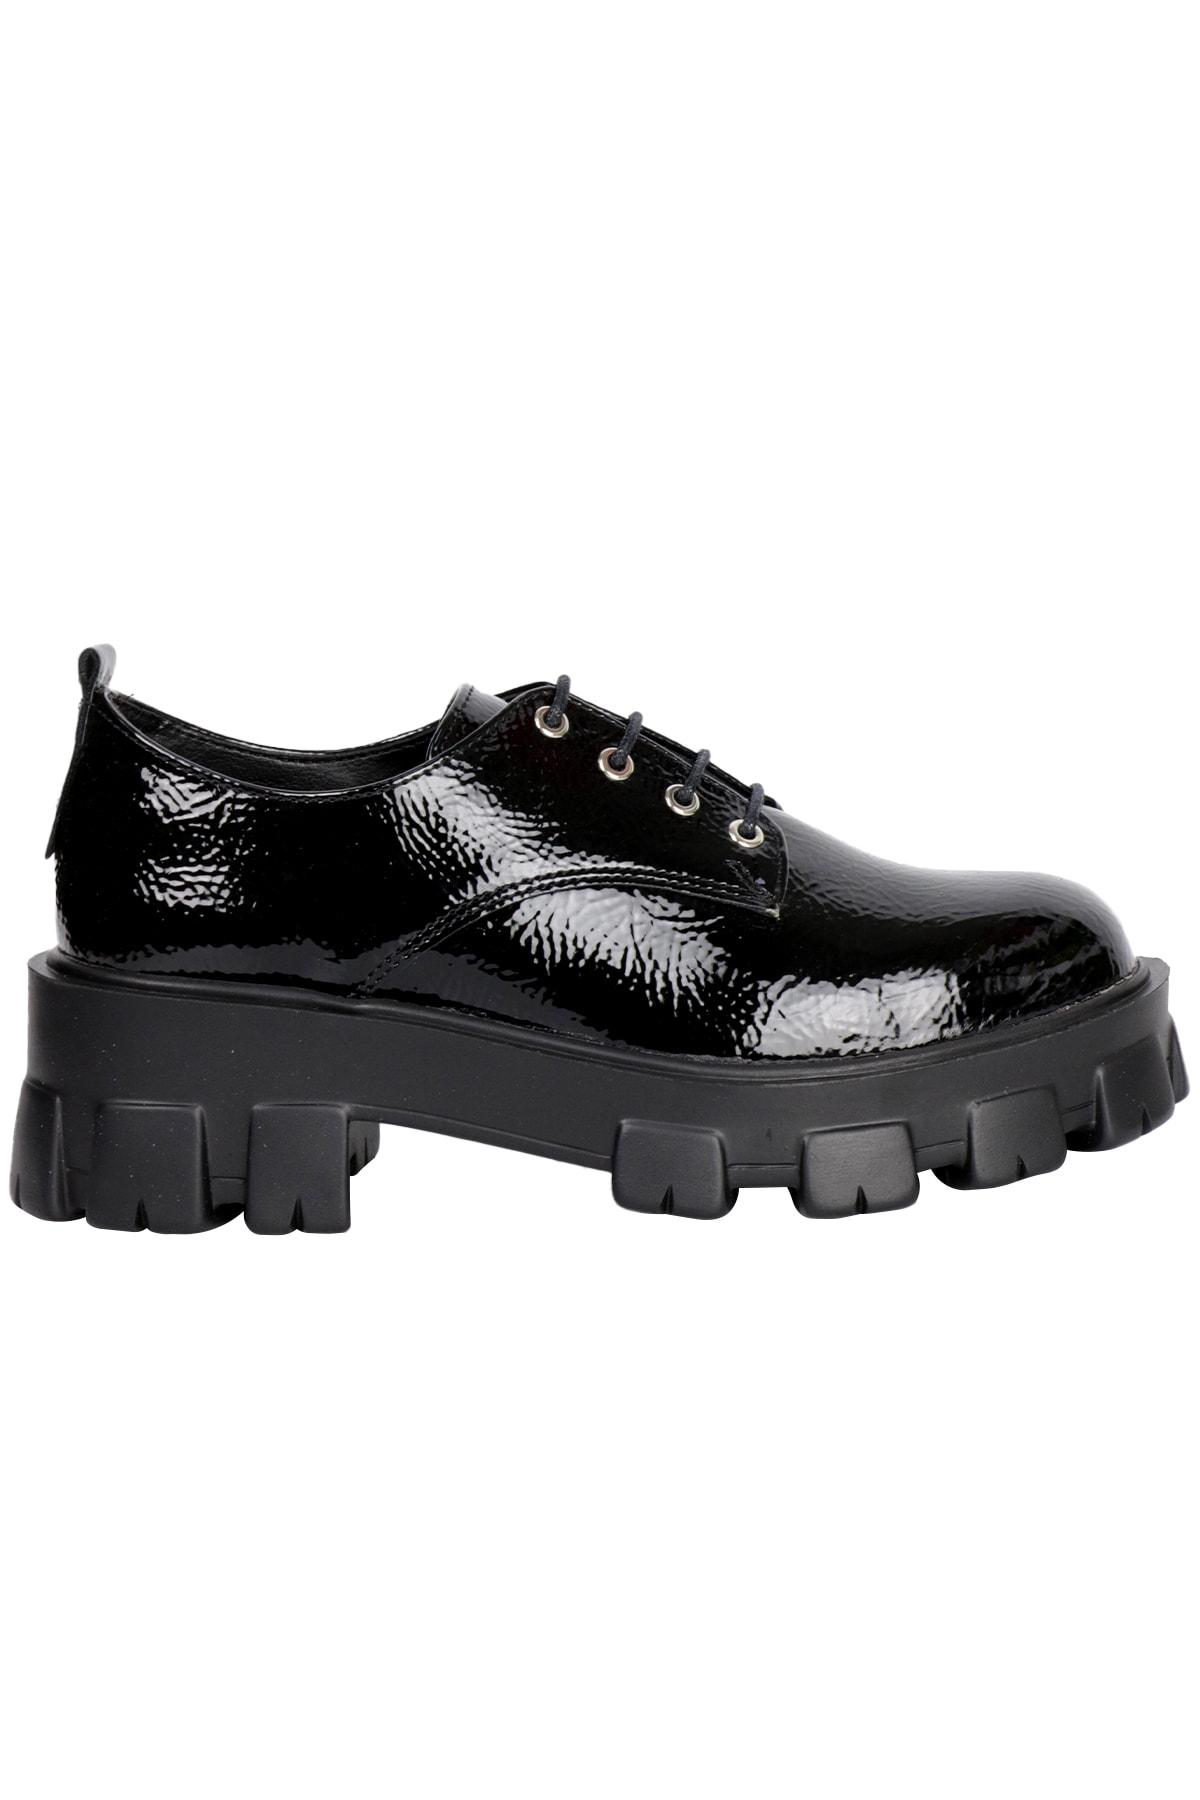 OZ DOROTHY Kadın Siyah Rugan Sneaker